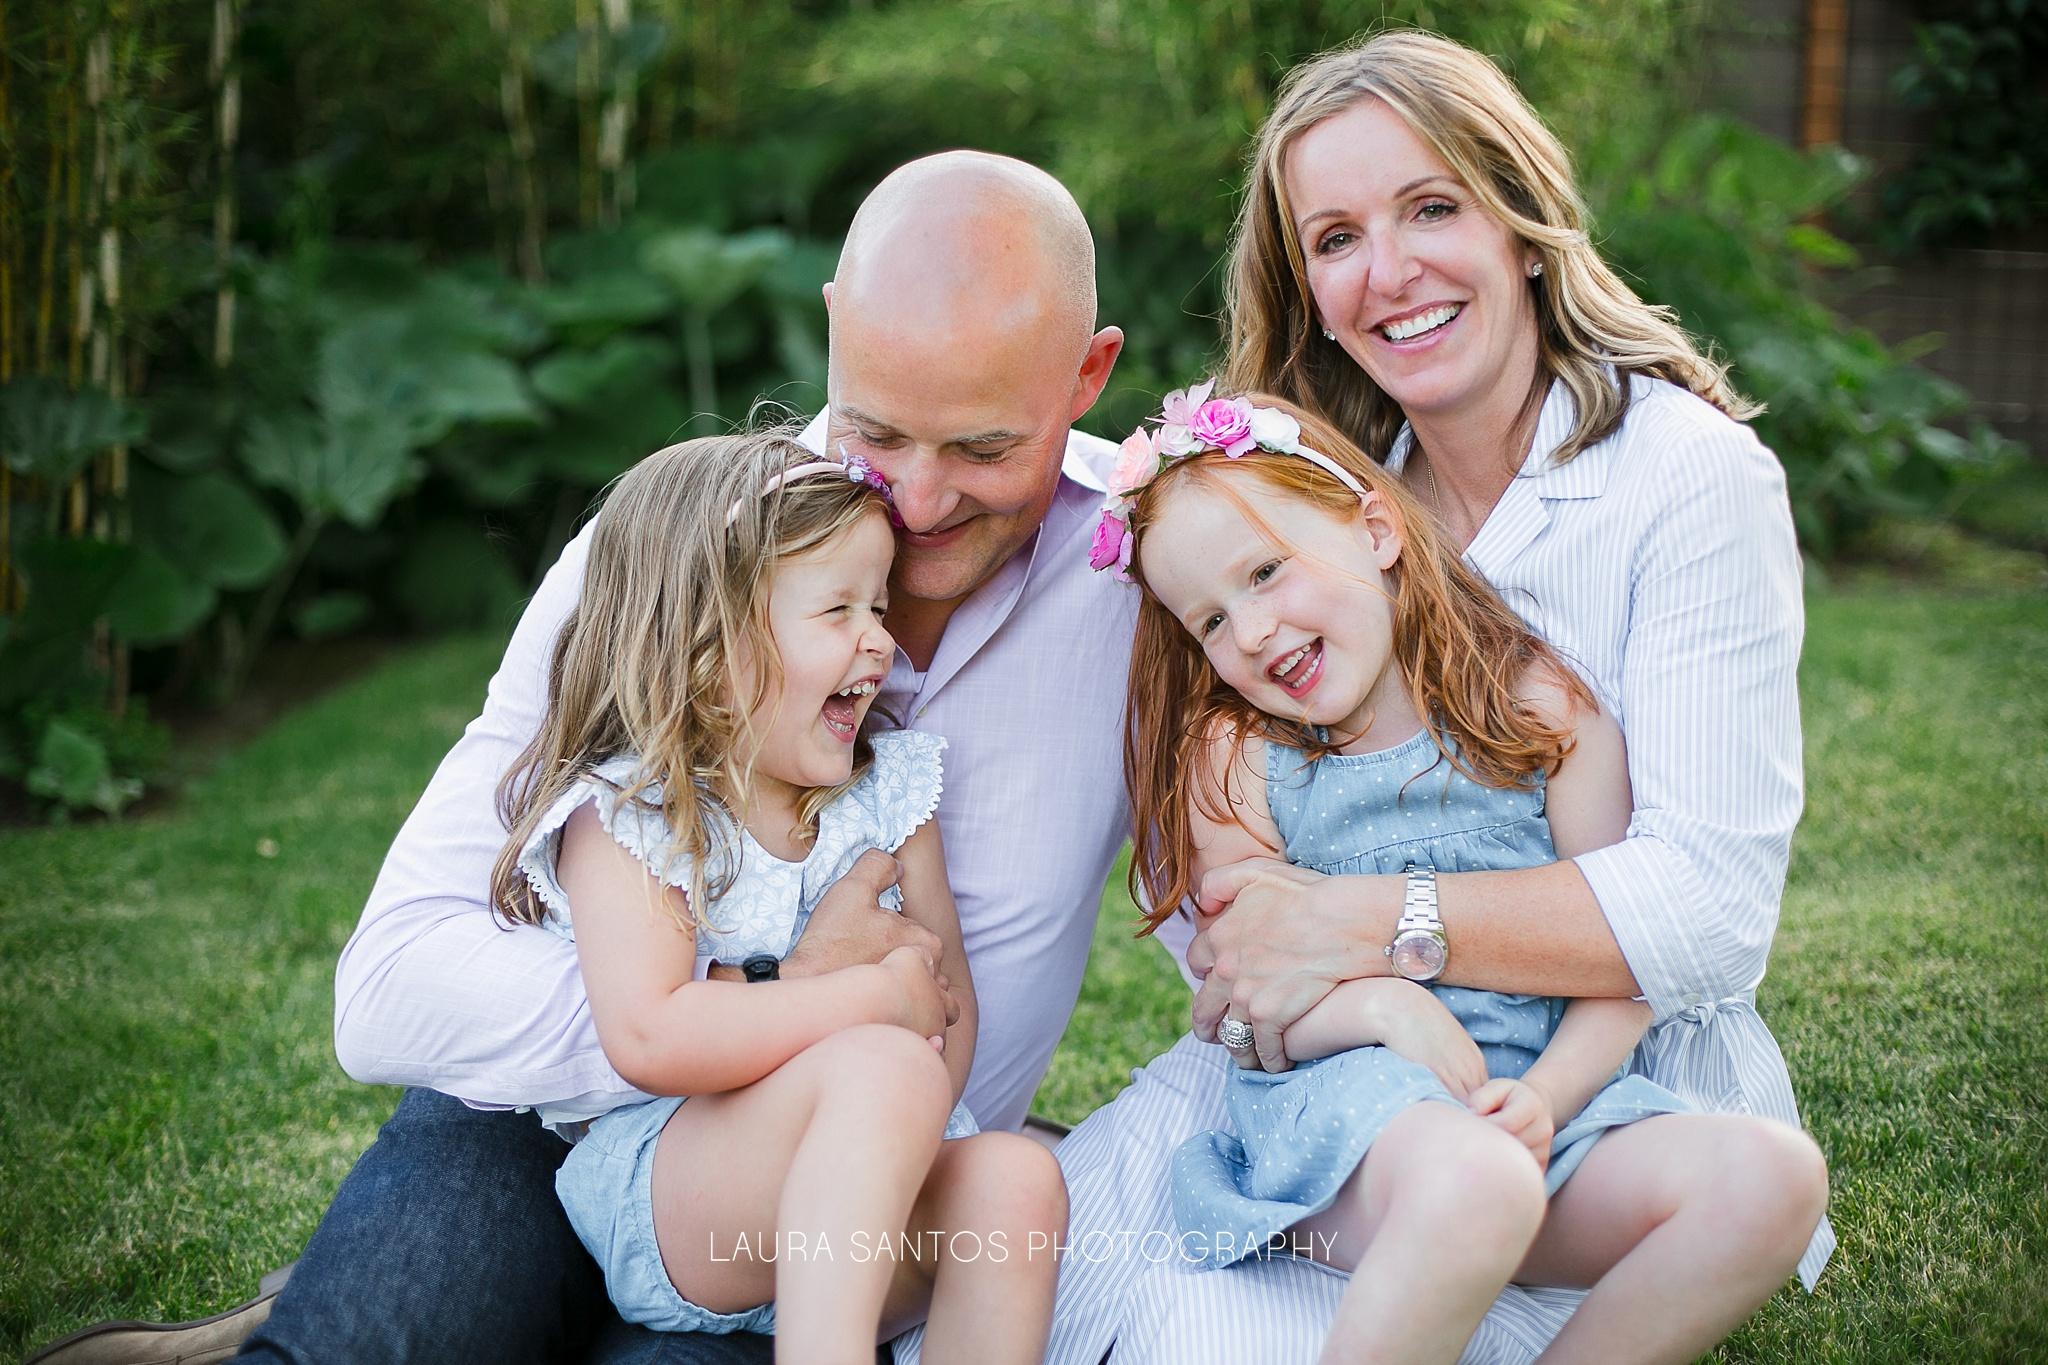 Laura Santos Photography Portland Oregon Family Photographer_0002.jpg